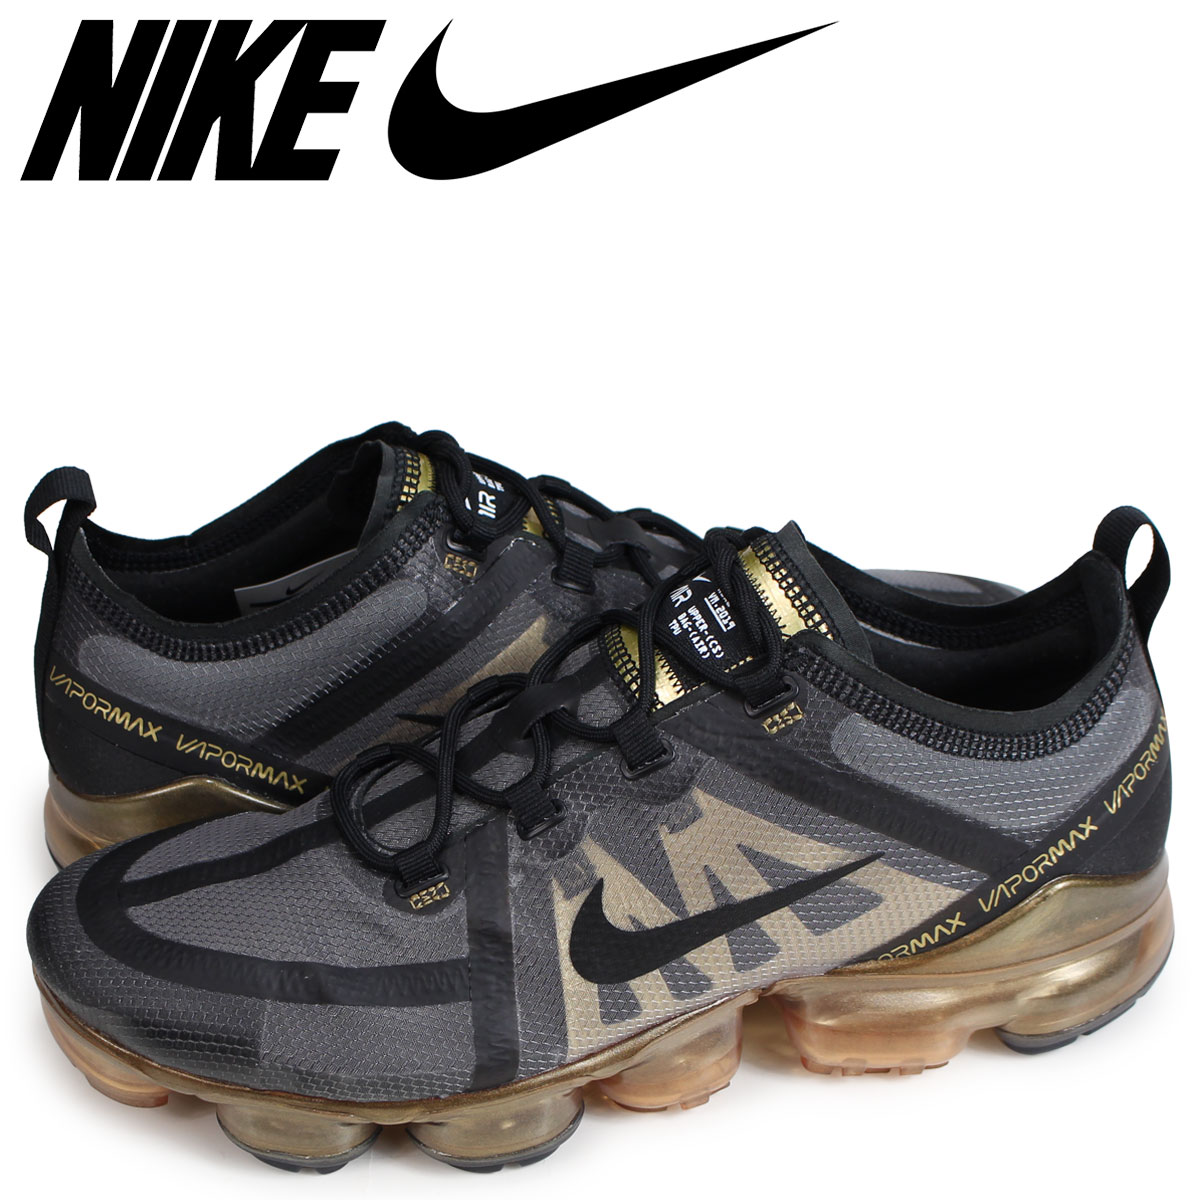 pretty nice 2c131 d37a4 NIKE AIR VAPORMAX 2019 Nike air vapor max 2019 sneakers men black AR6631-002